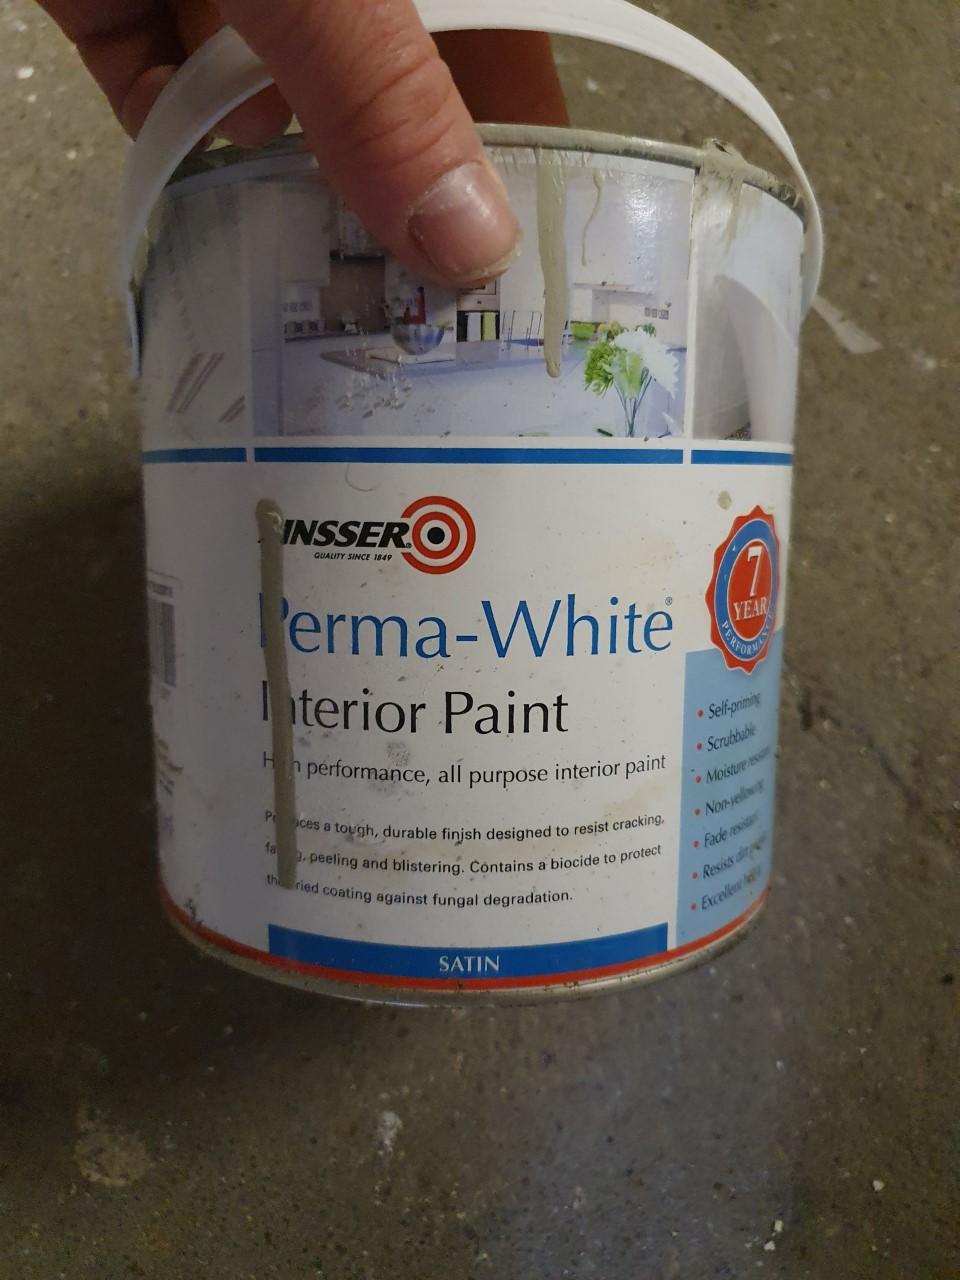 Decorators Review Zinsser Perma-White